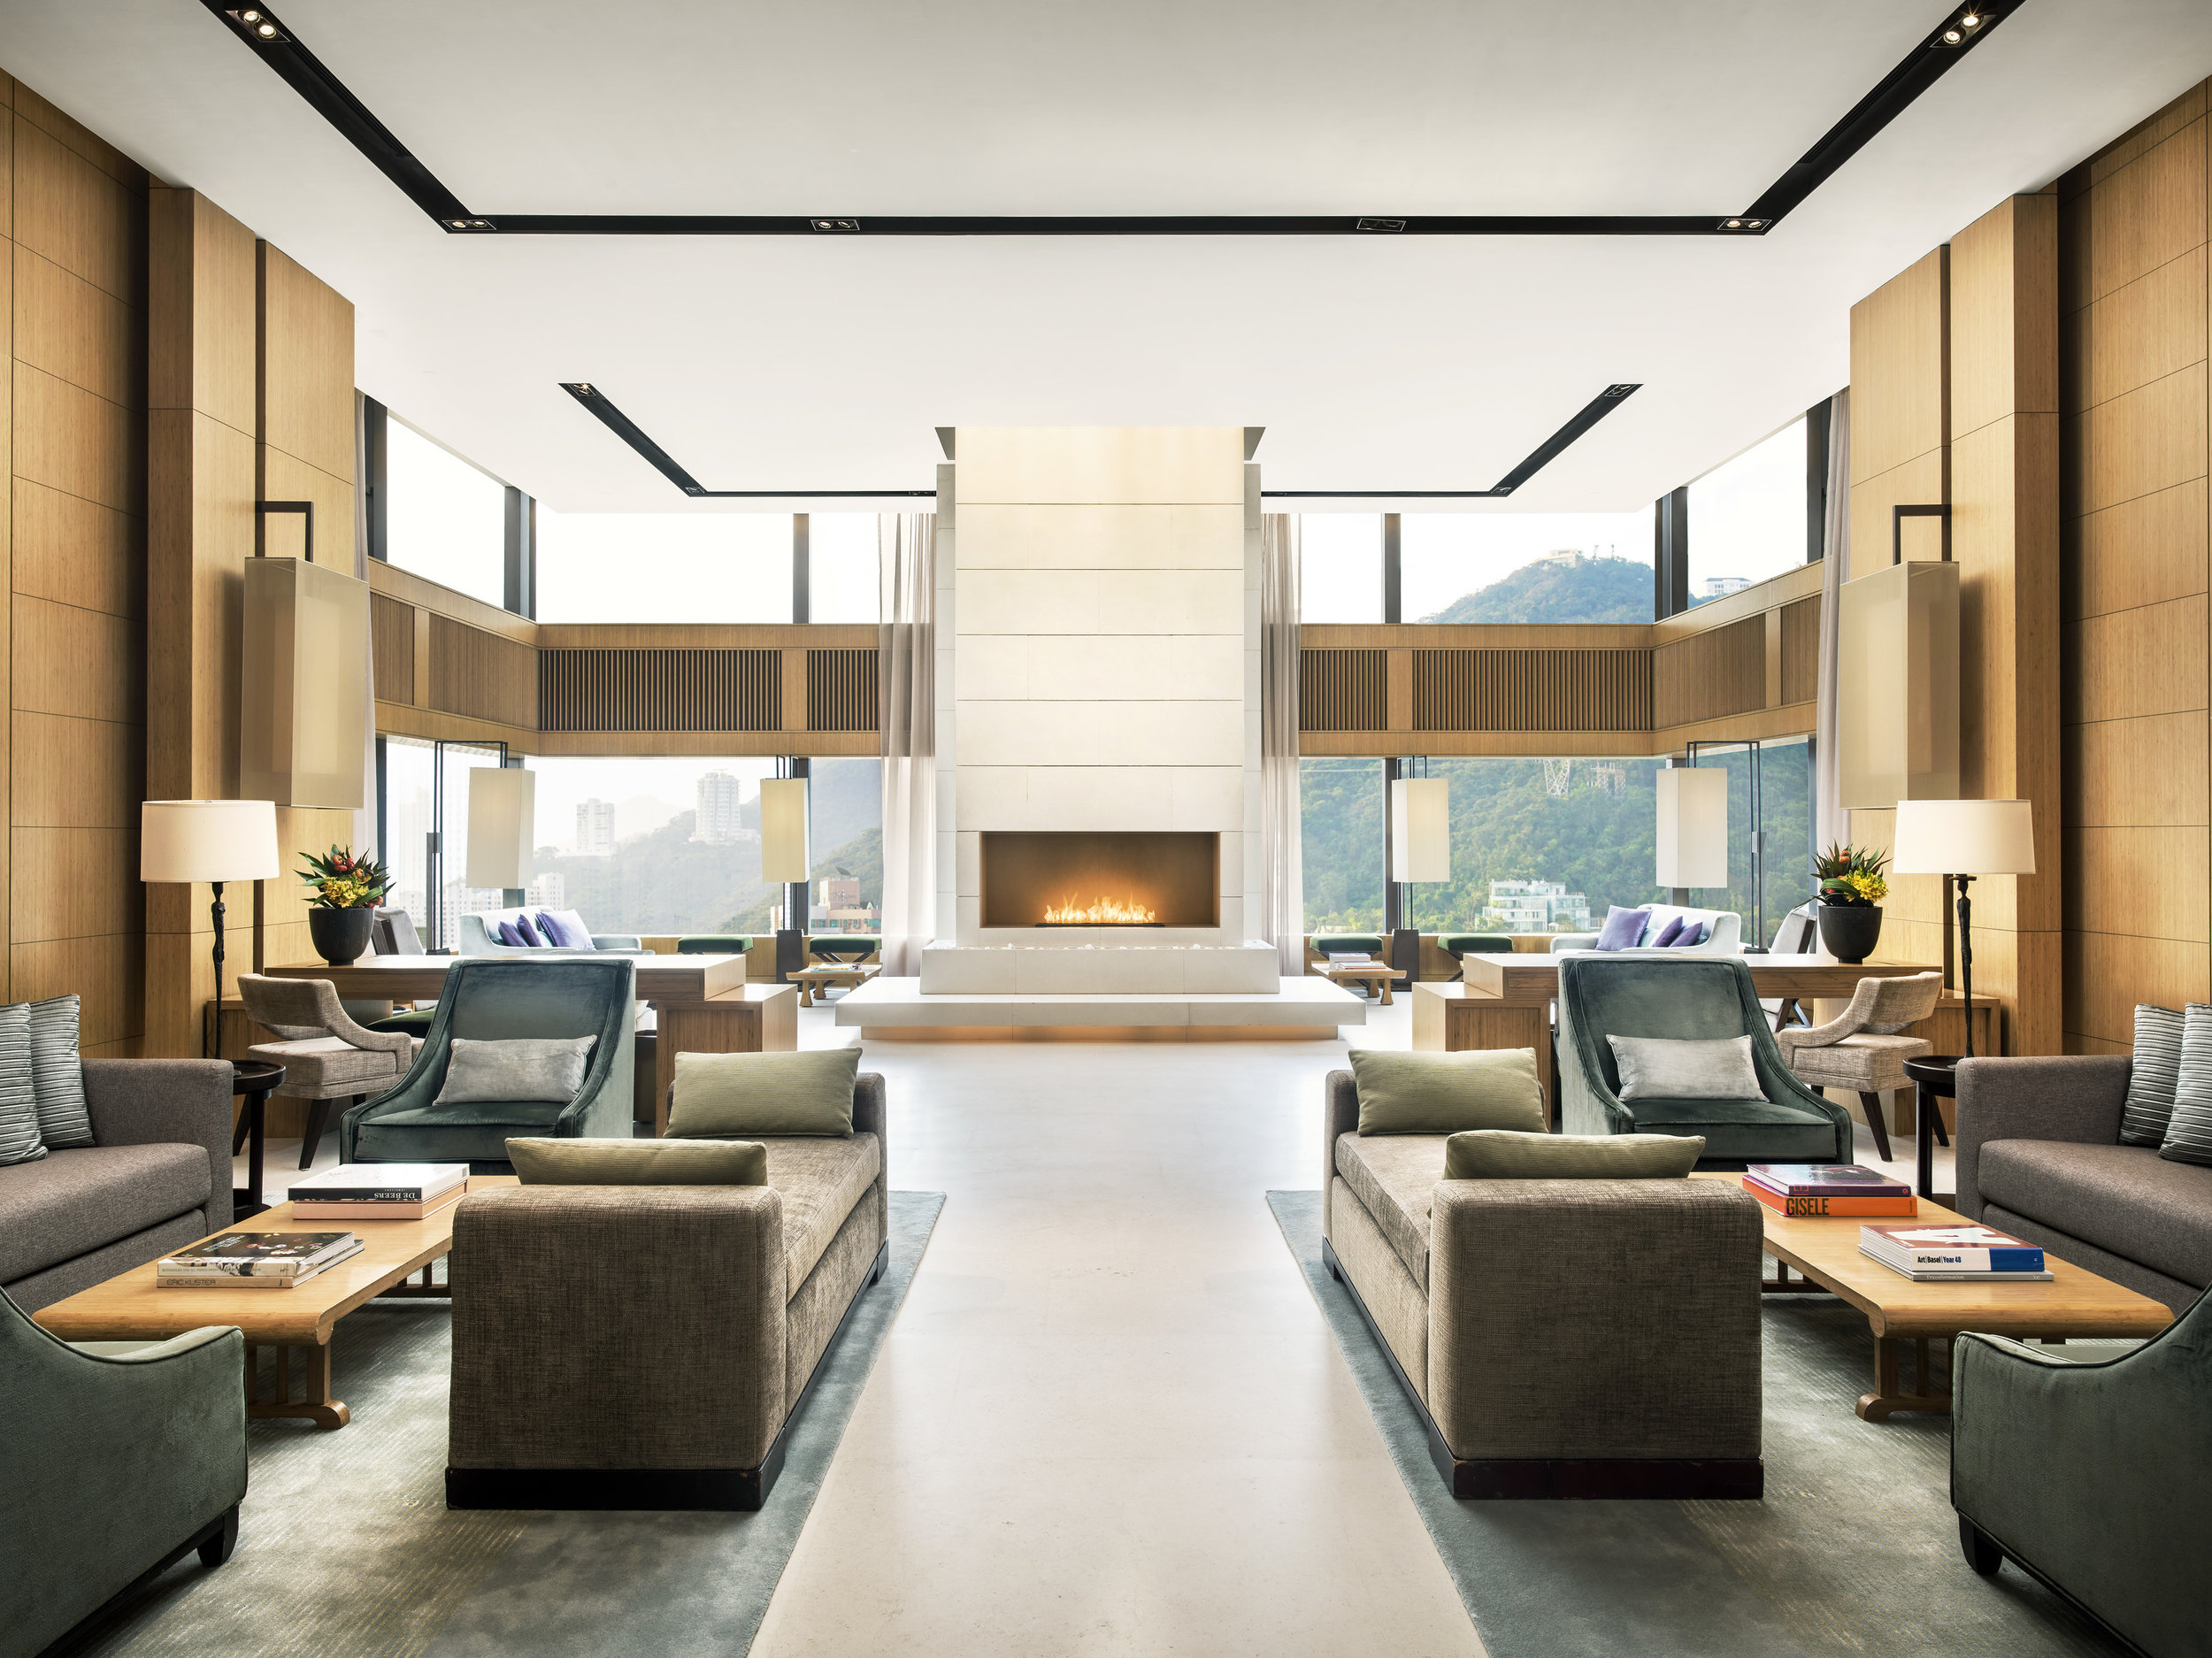 The Upper House_Level 49_Sky Lounge full view (day).jpg